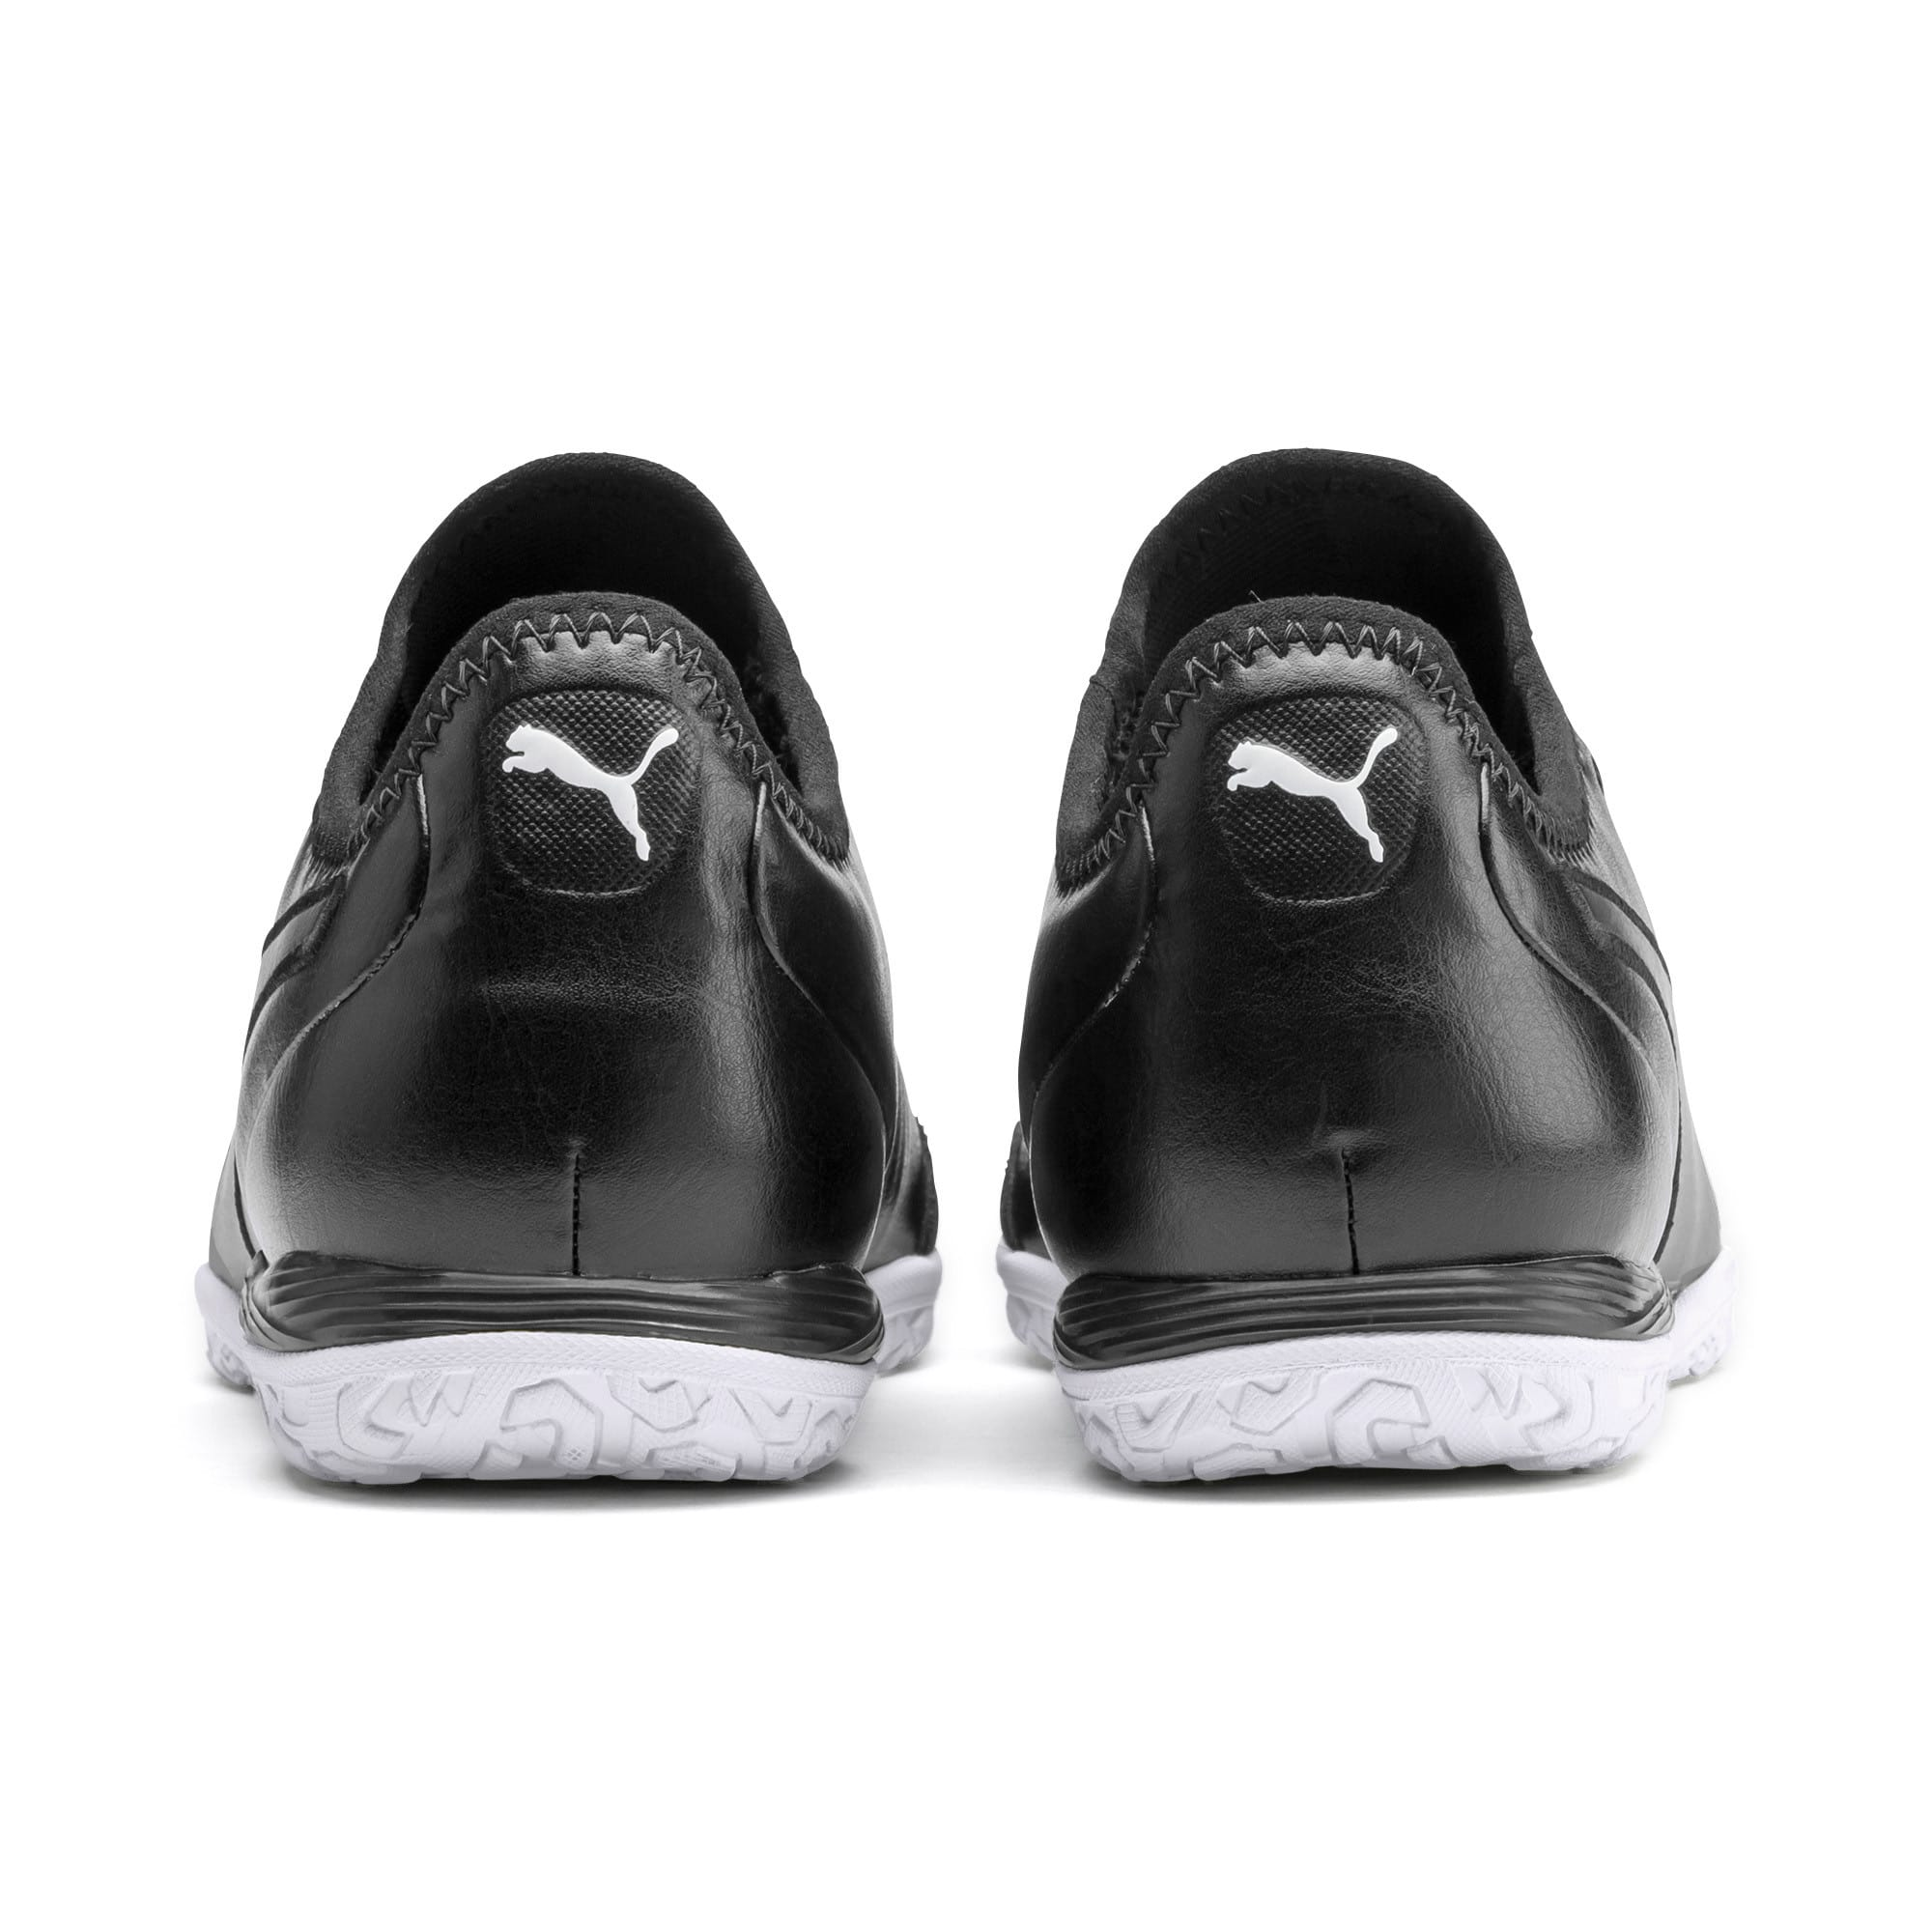 Thumbnail 4 of King Pro IT Soccer Shoes, Puma Black-Puma White, medium